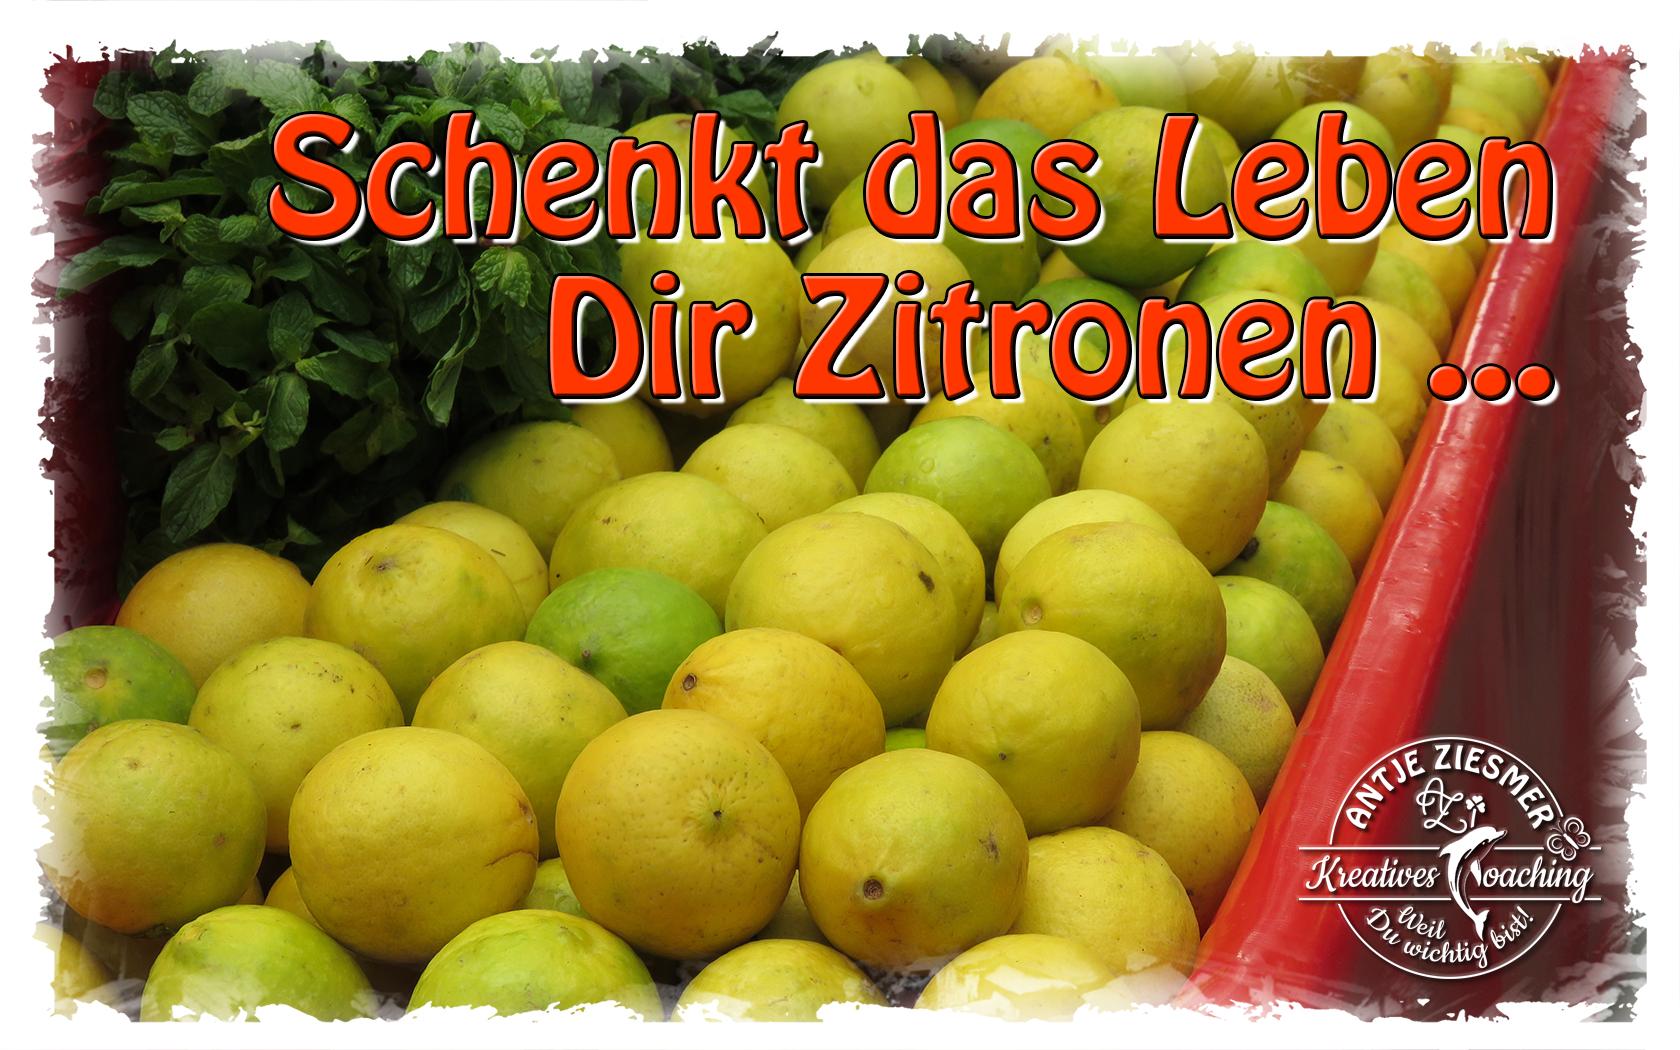 You are currently viewing Schenkt Dir das Leben Zitronen